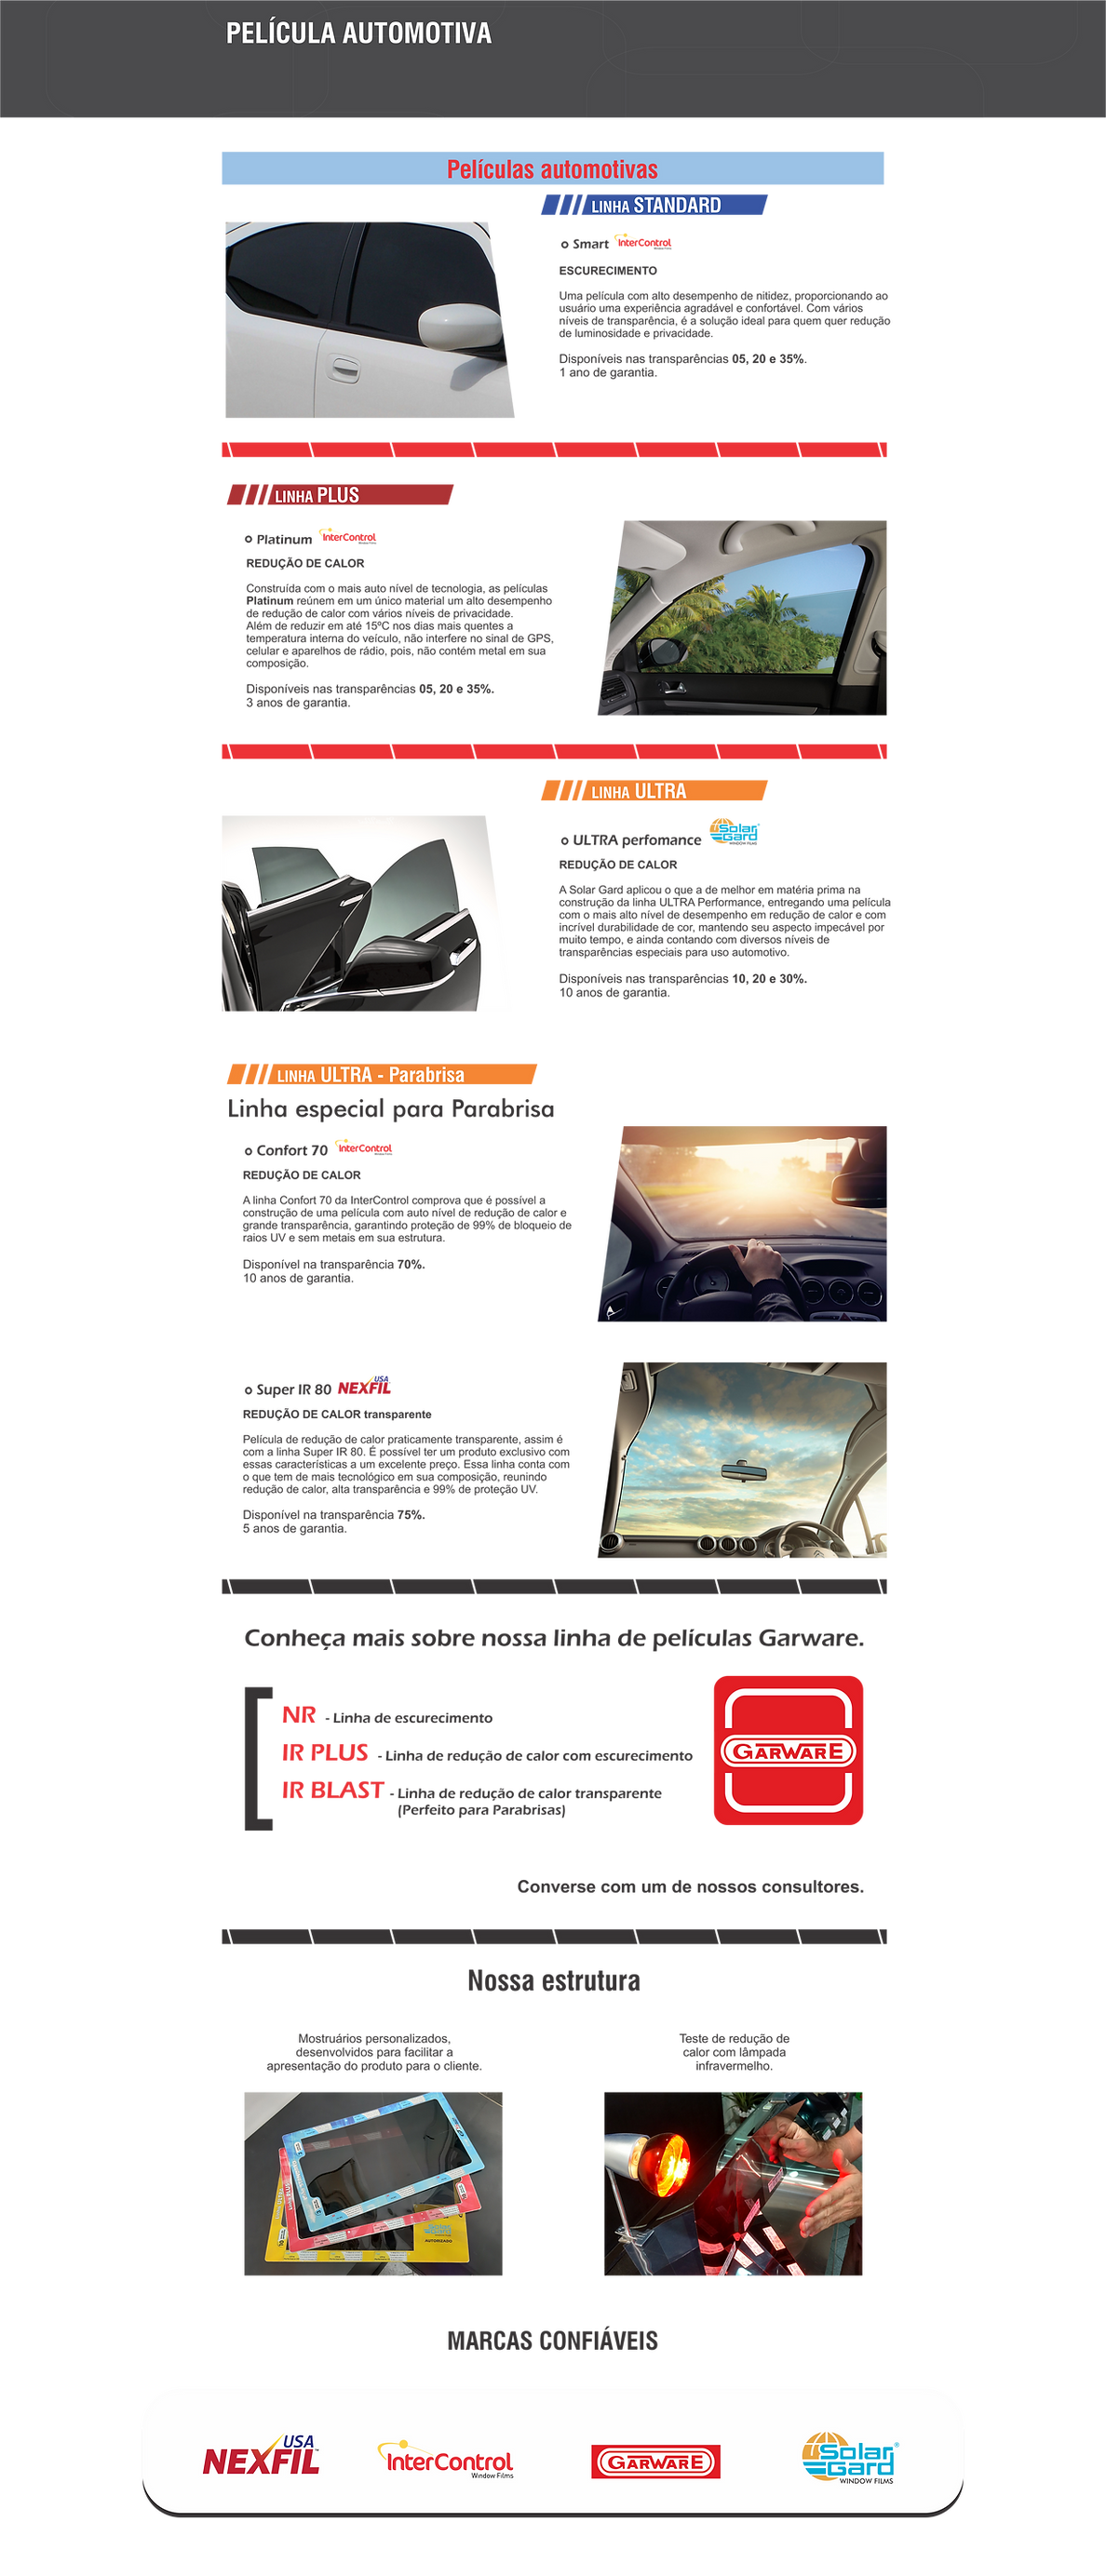 Pagina peliculas - site wix 2020.png